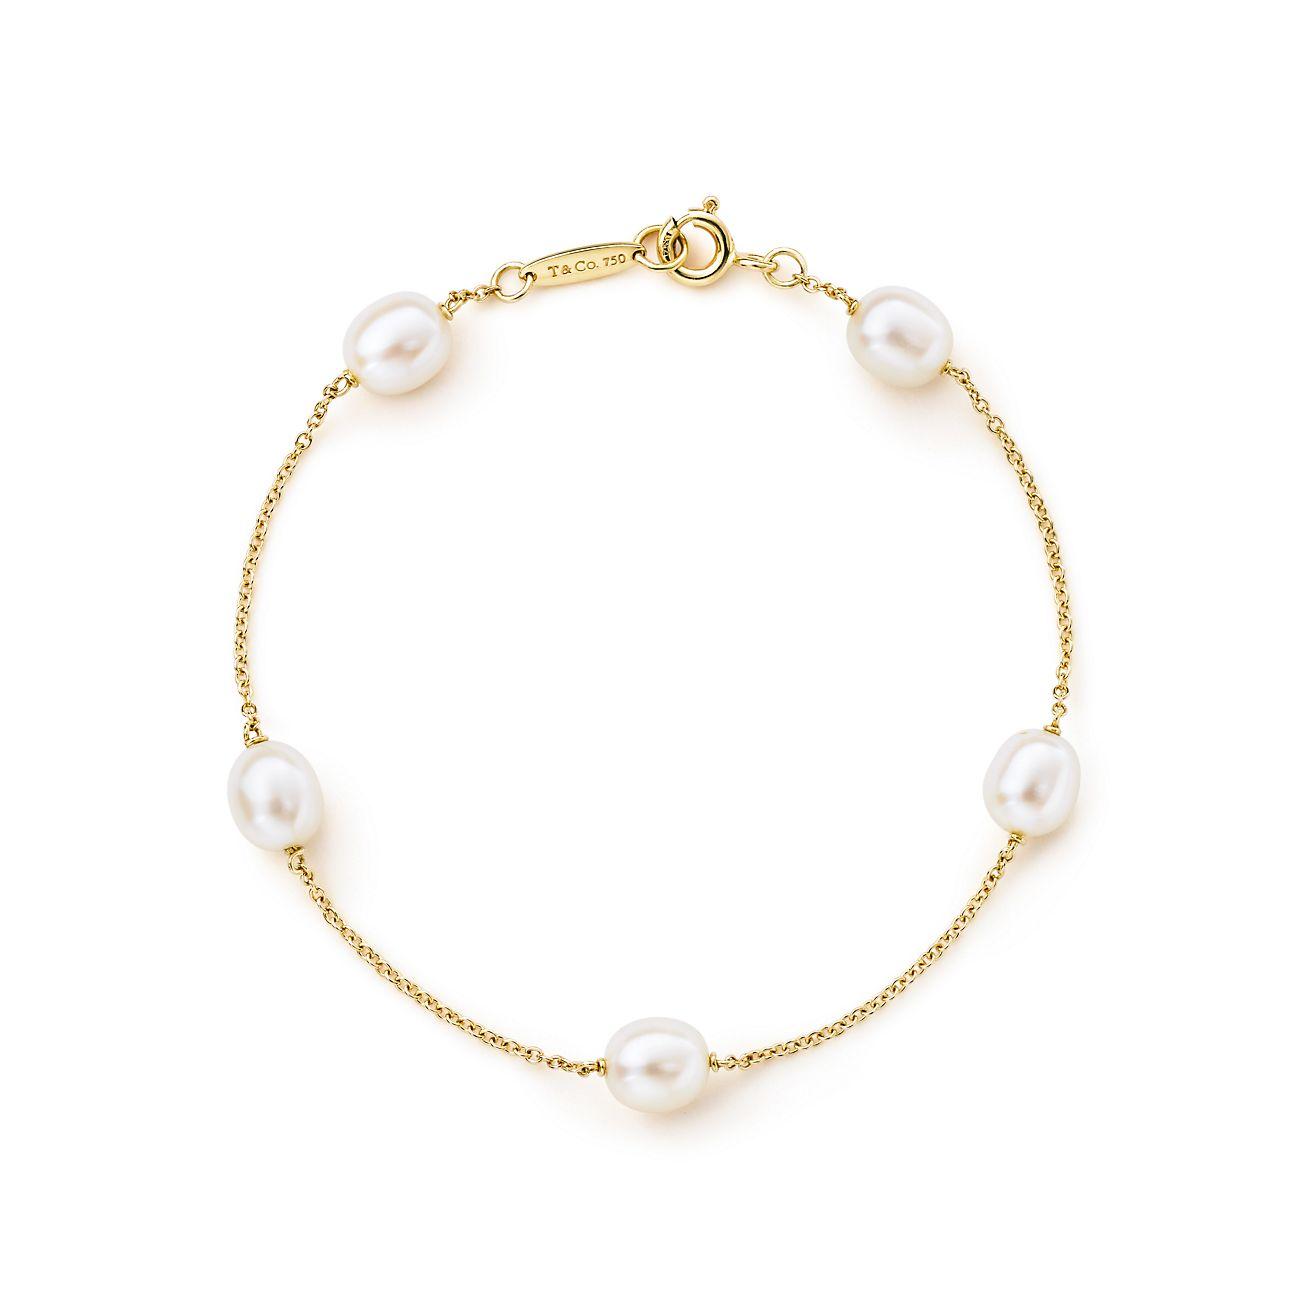 Elsa Peretti Pearls by the Yard bracelet in sterling silver - Size Tiffany & Co.